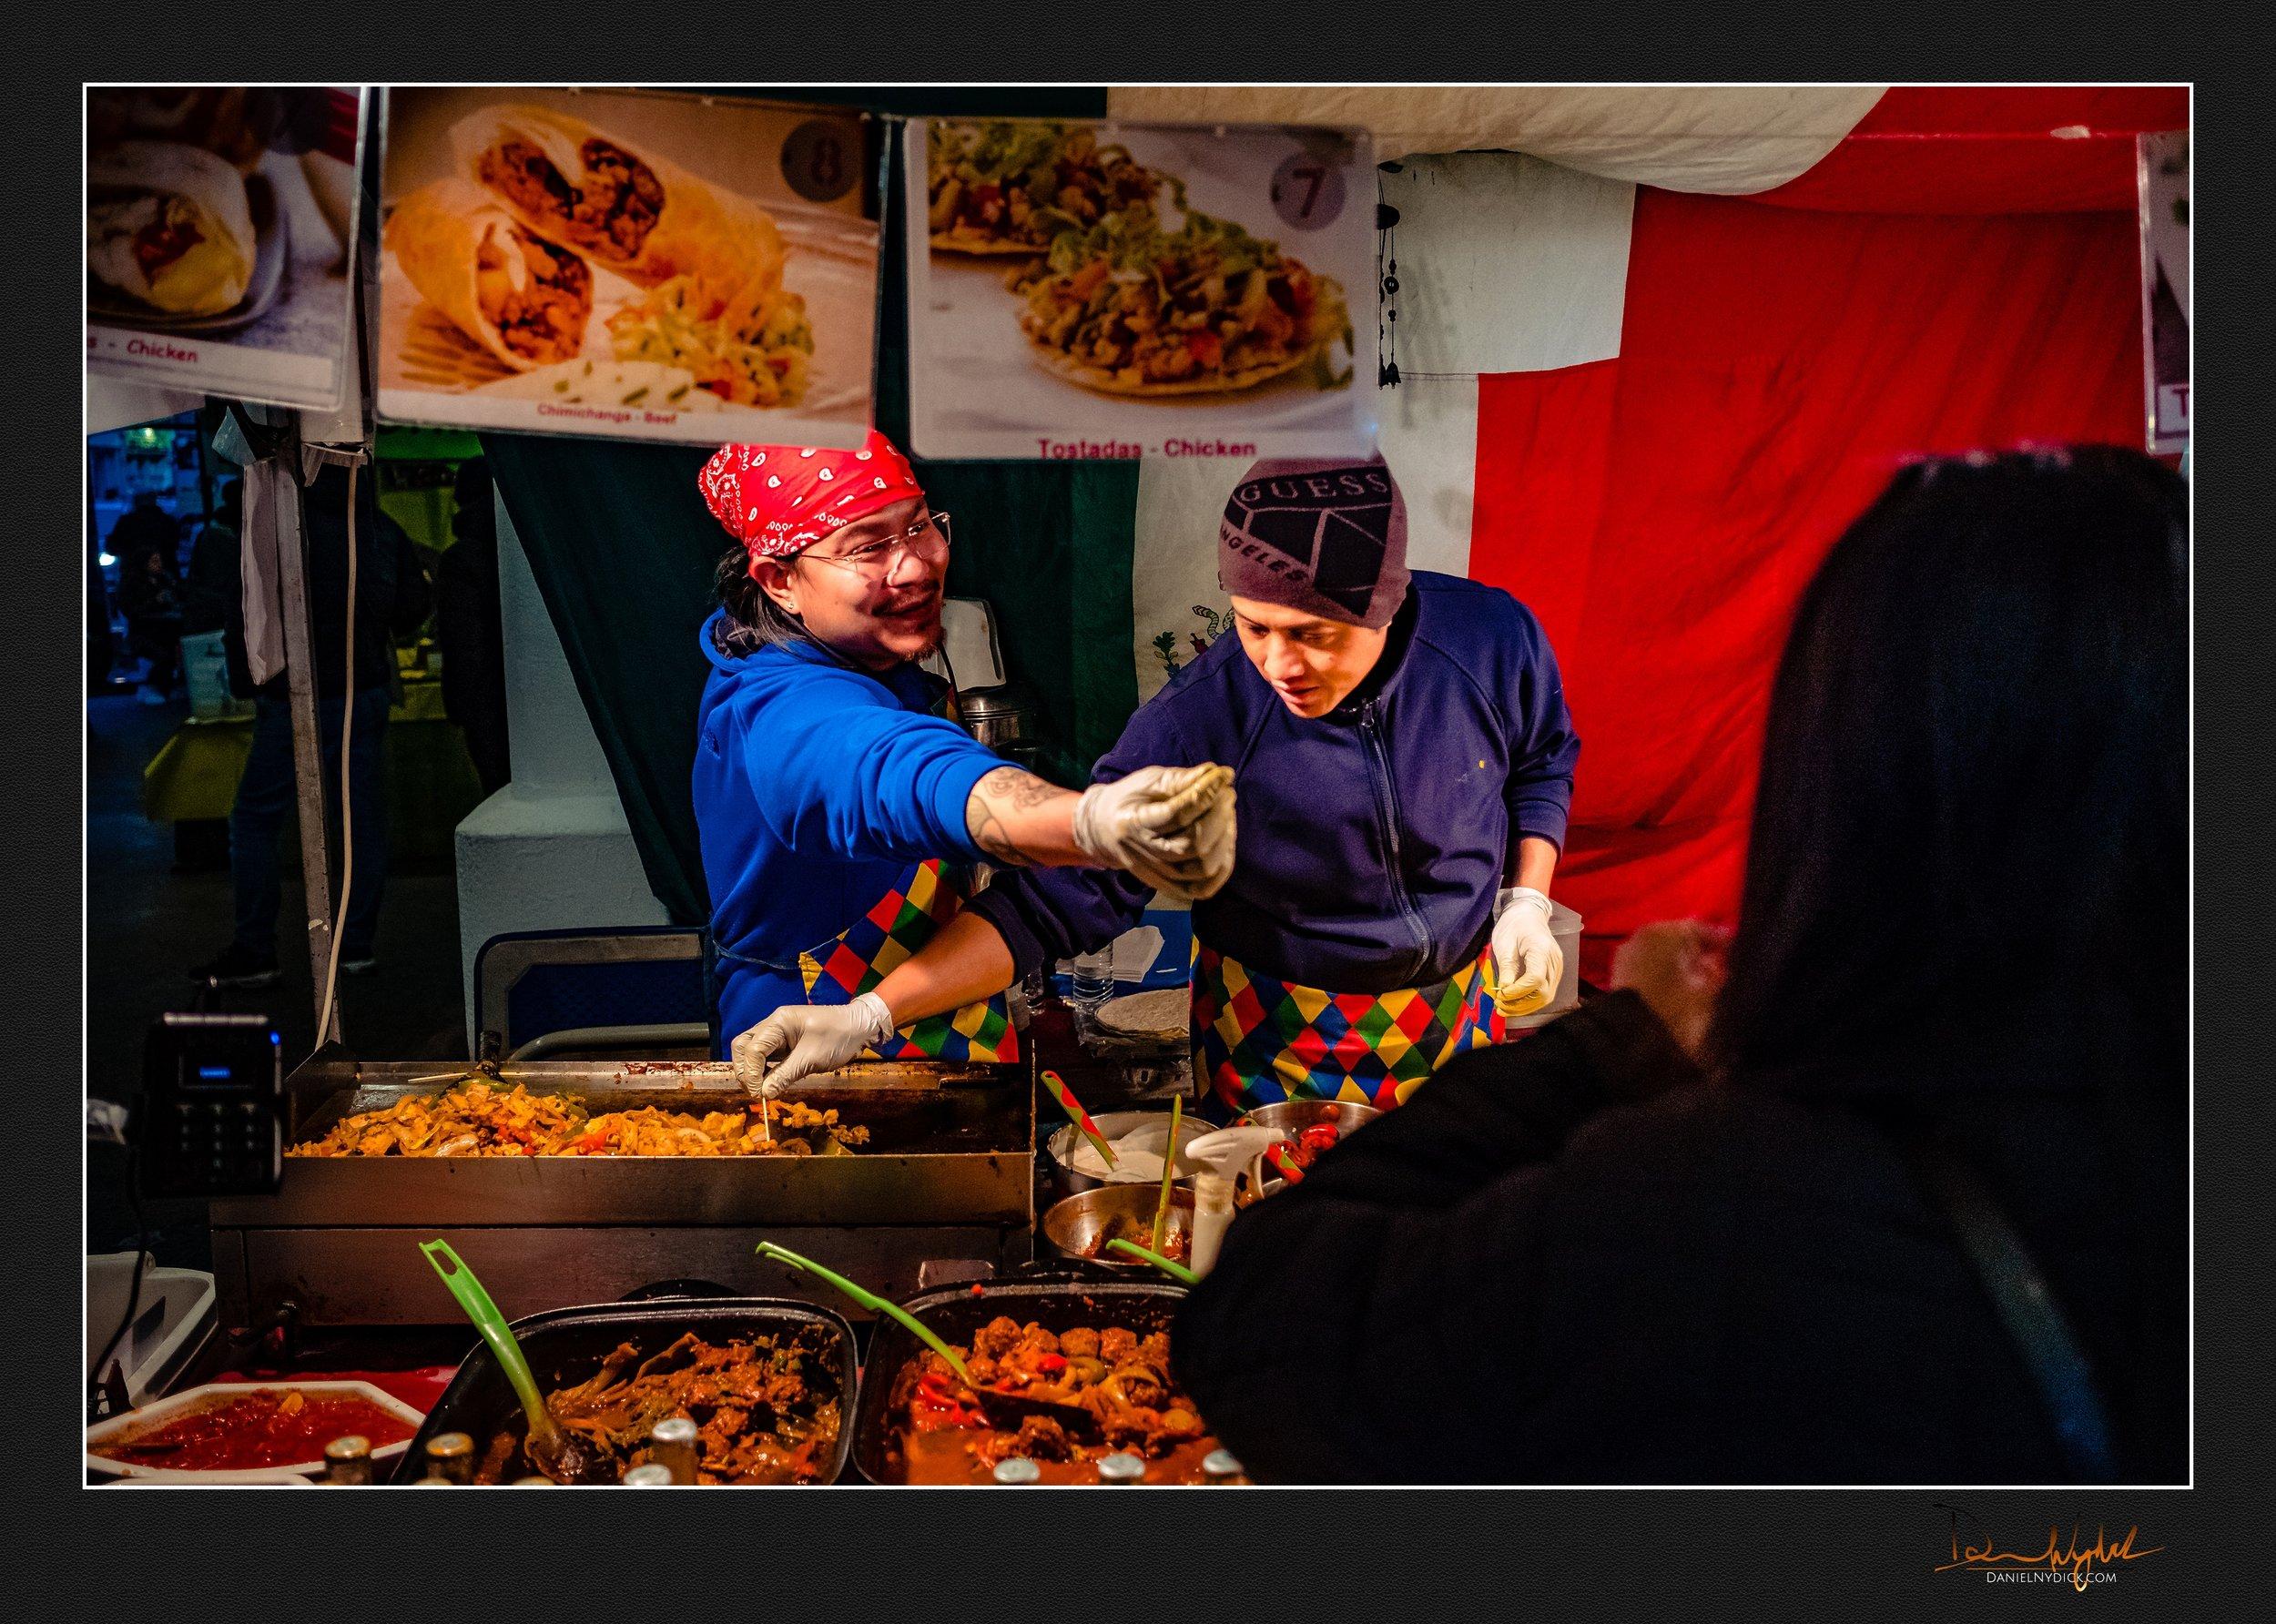 bricklnae market, food vendor handing food and smiling